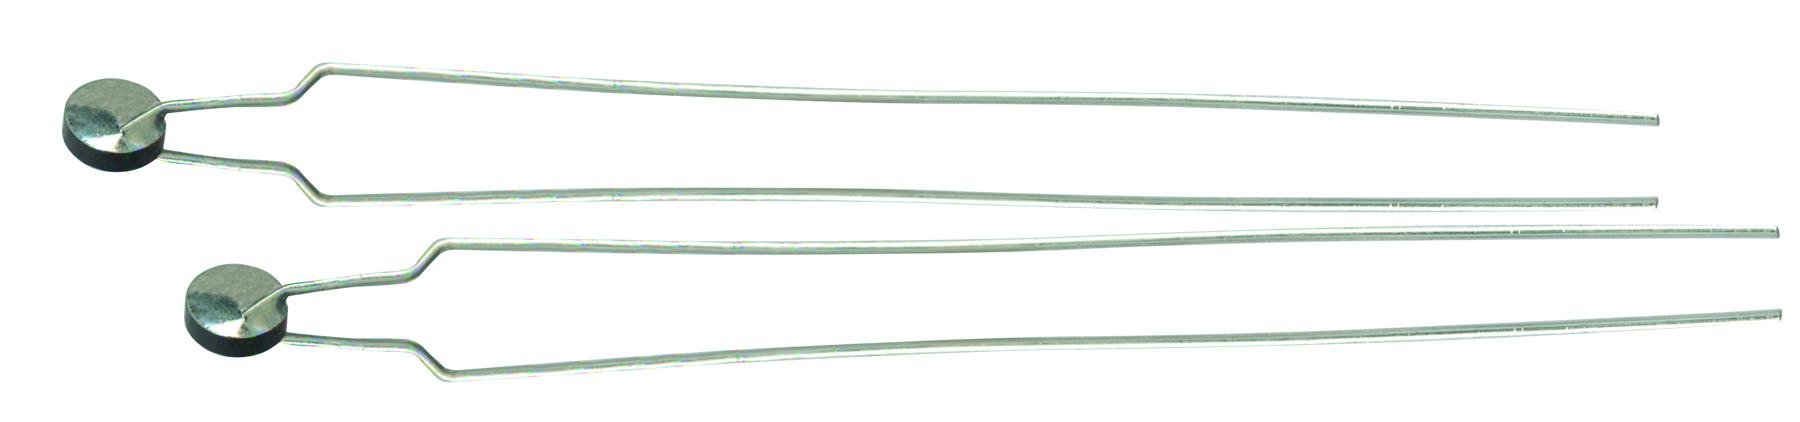 Thermometrics NTC Thermistors | Radial Lead Type RL10